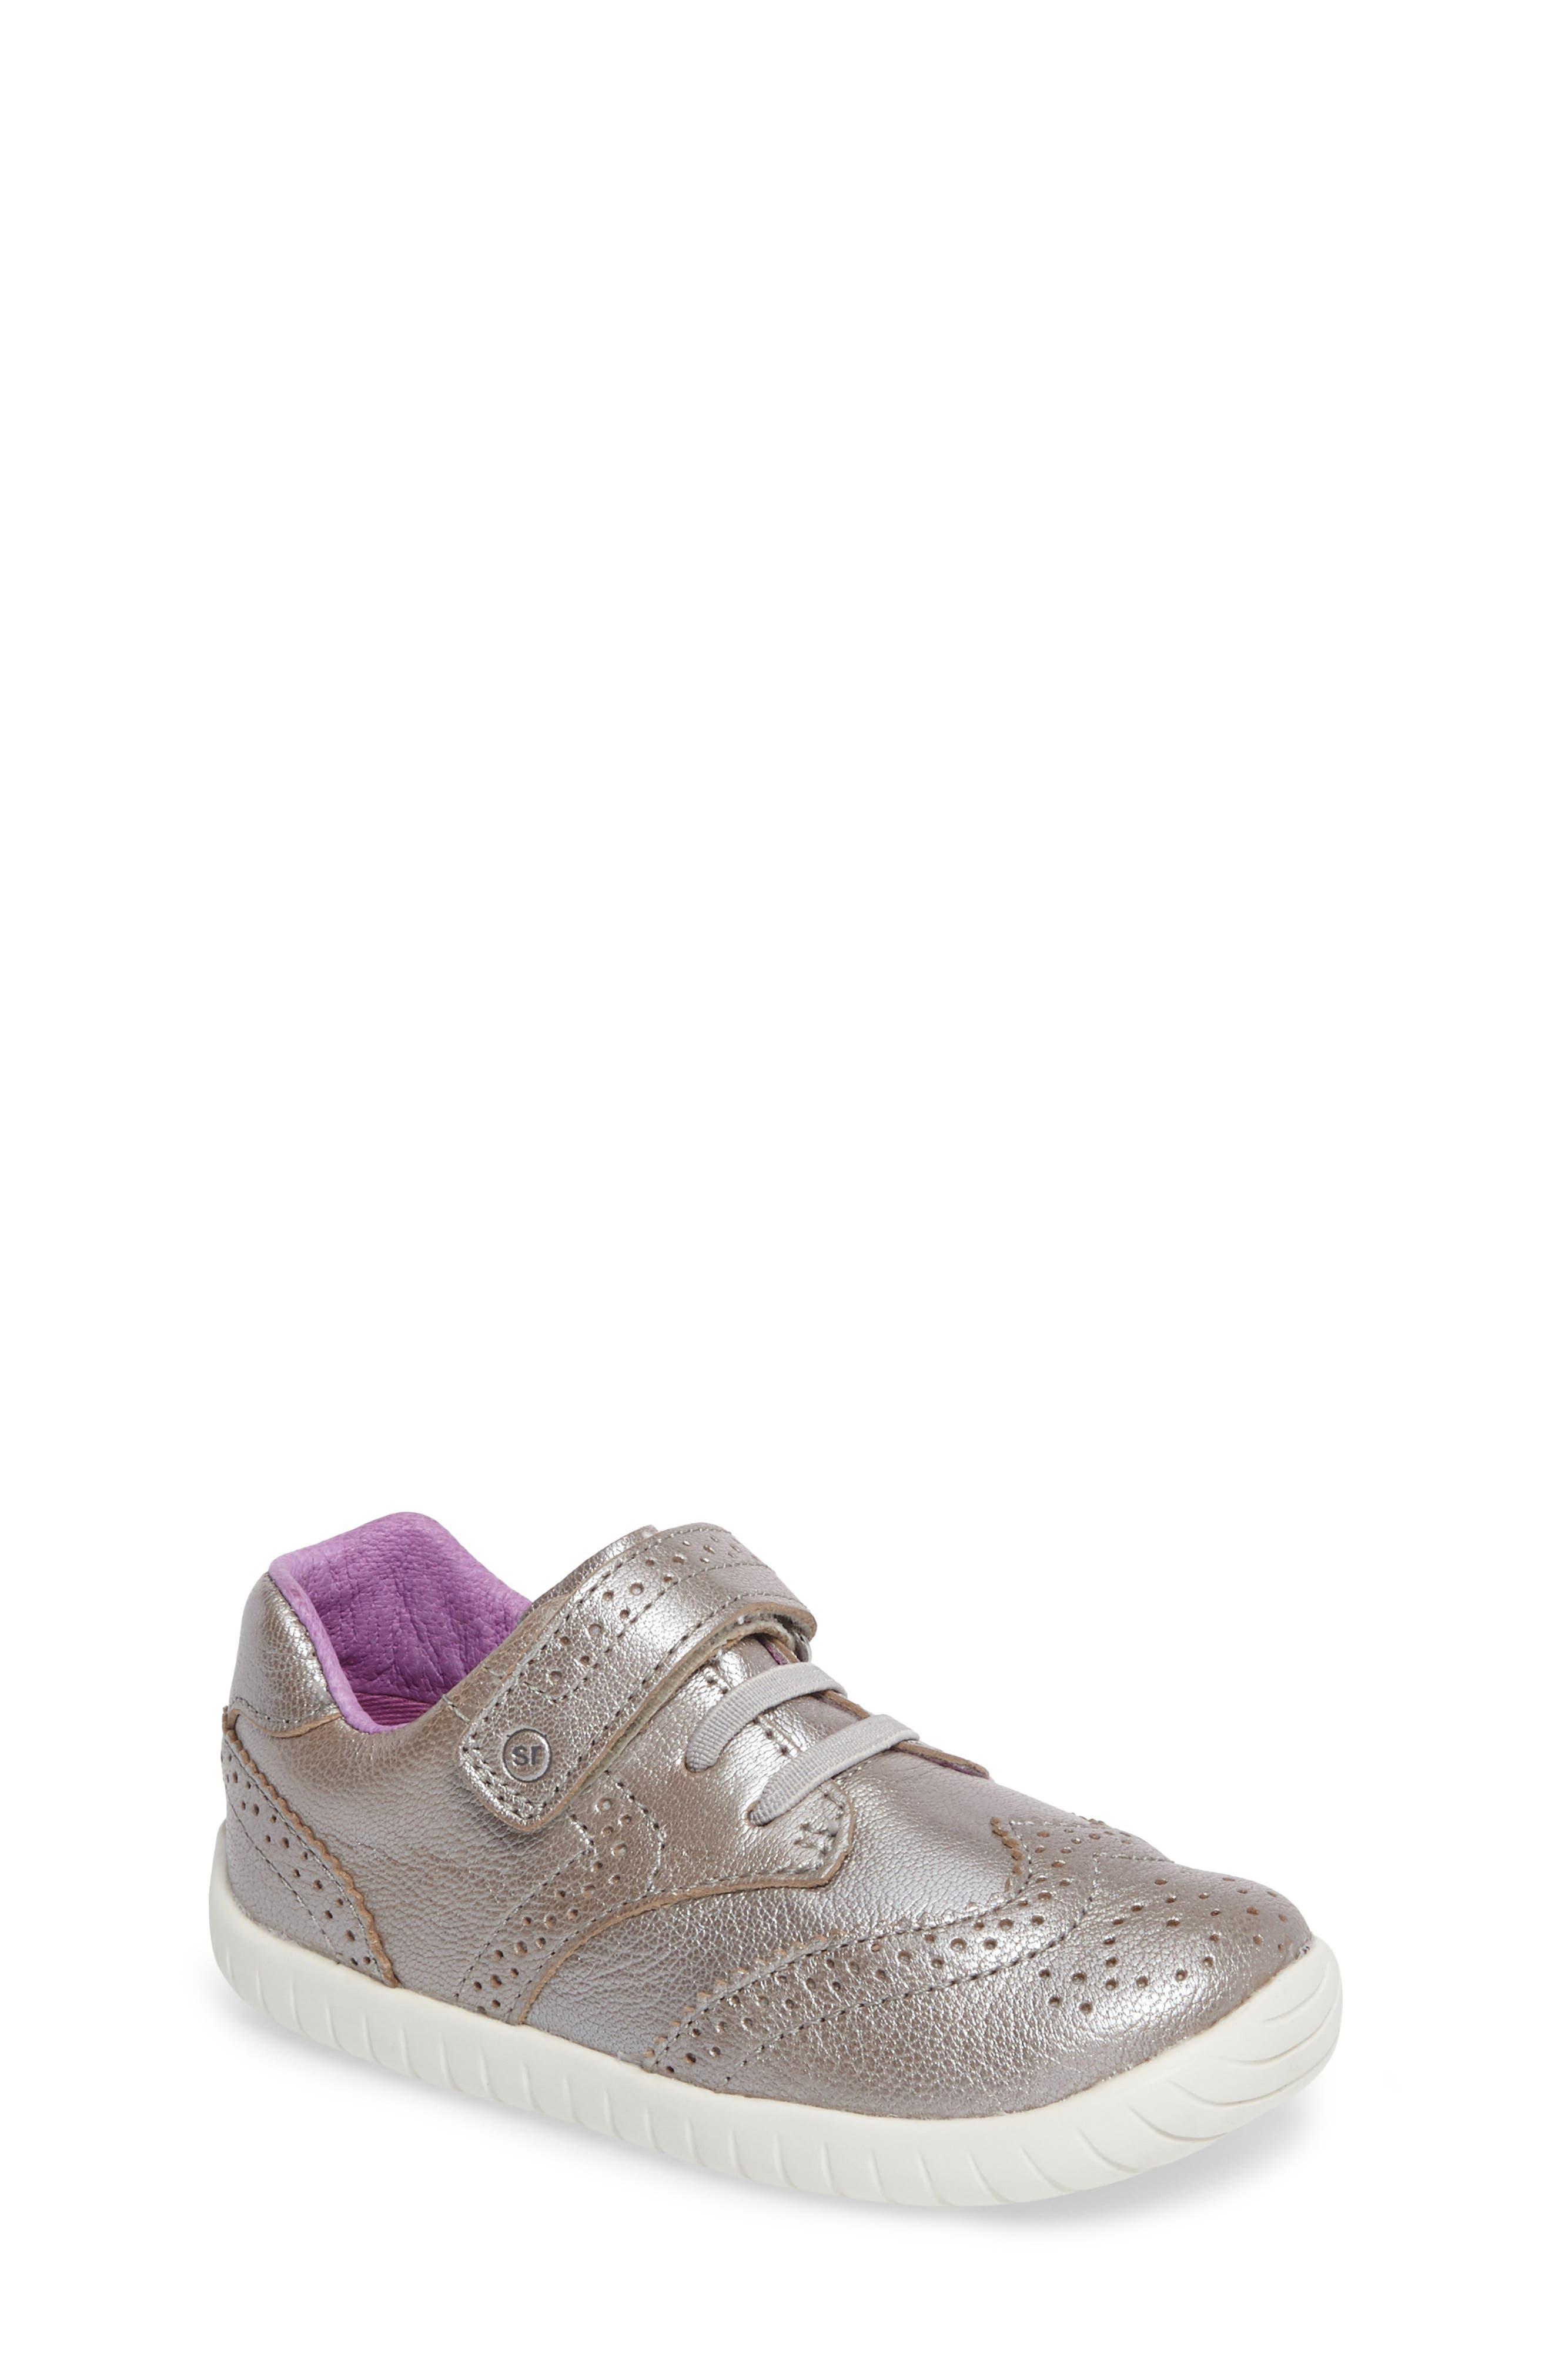 Alternate Image 1 Selected - Stride Rite Addison Metallic Wingtip Sneaker (Baby, Walker & Toddler)